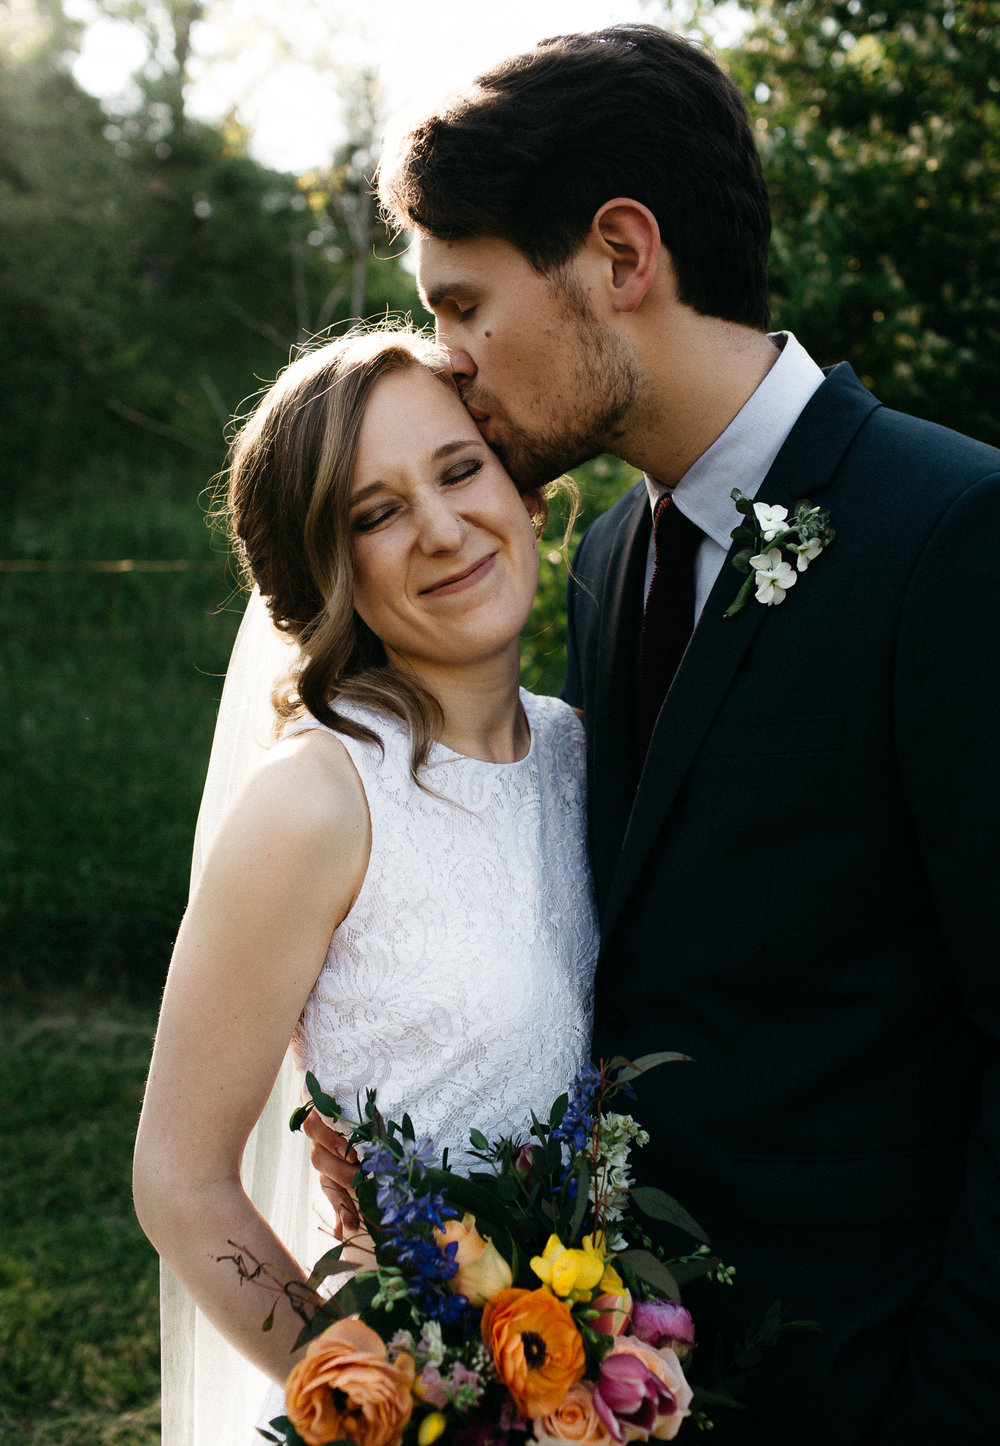 eastlyn bright intimate ohio backyard bohemian forest wedding photographer -93.jpg